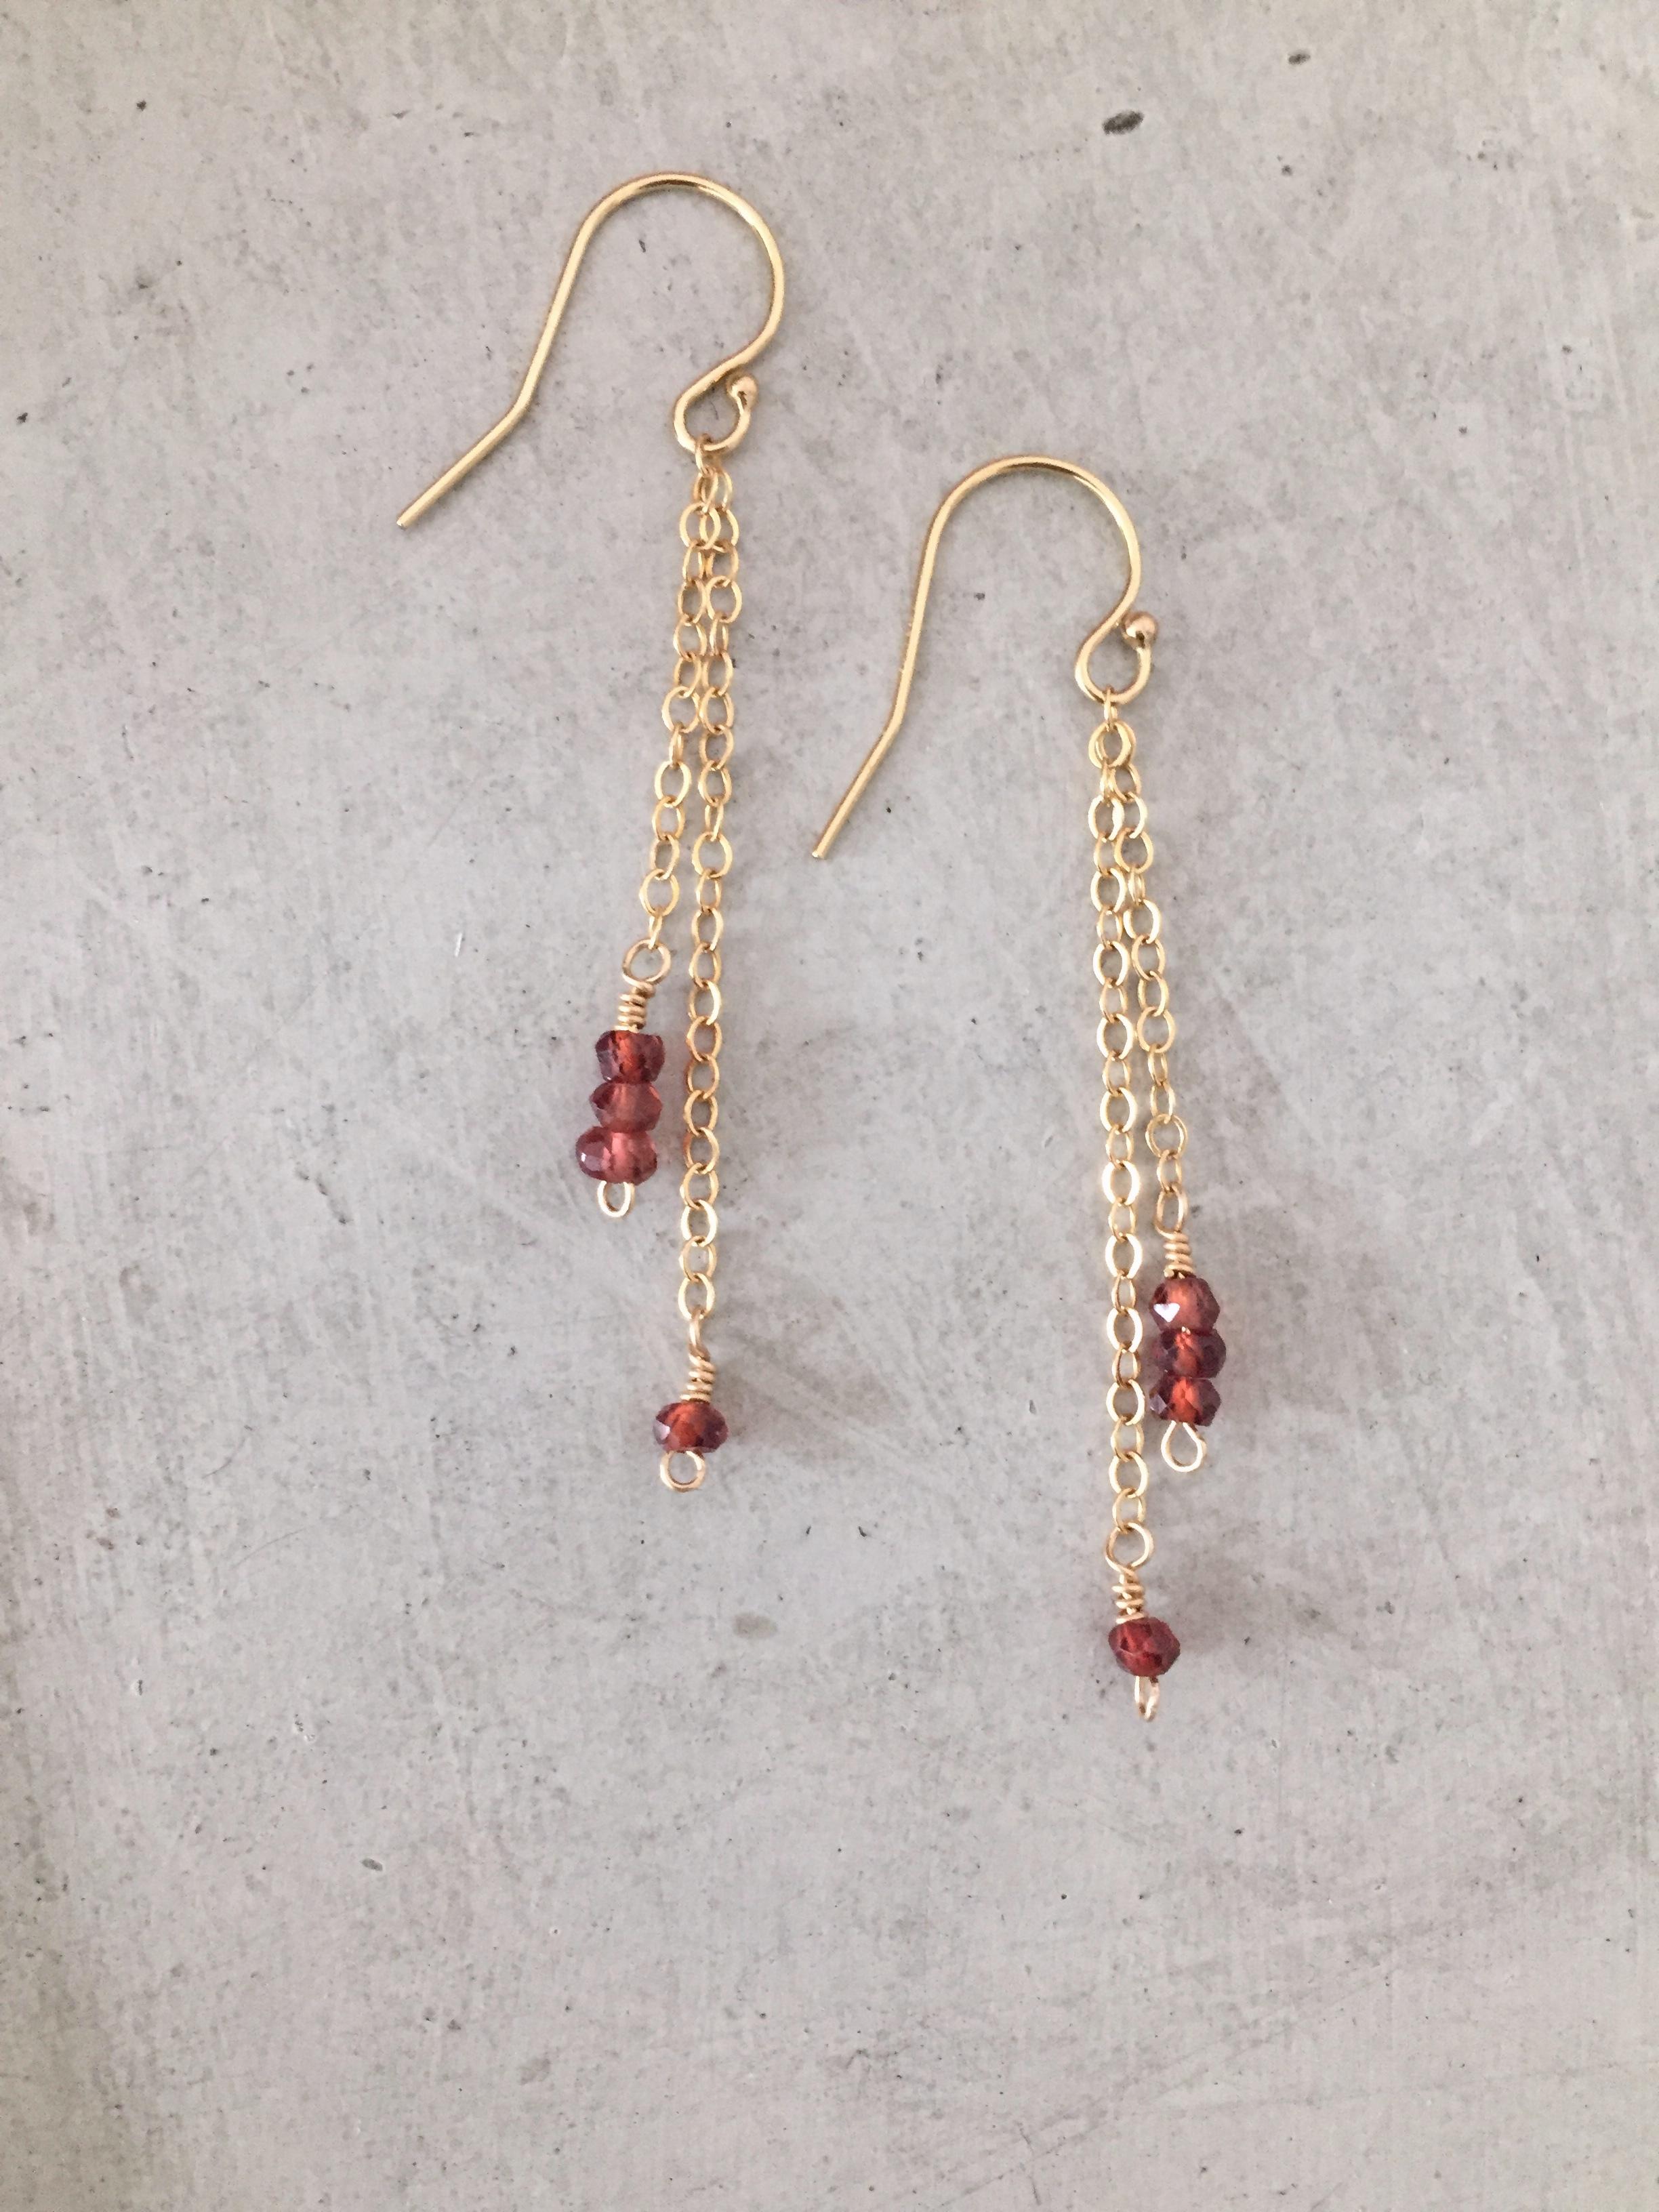 Garnet drop earrings reija eden jewelry for Custom made jewelry stores